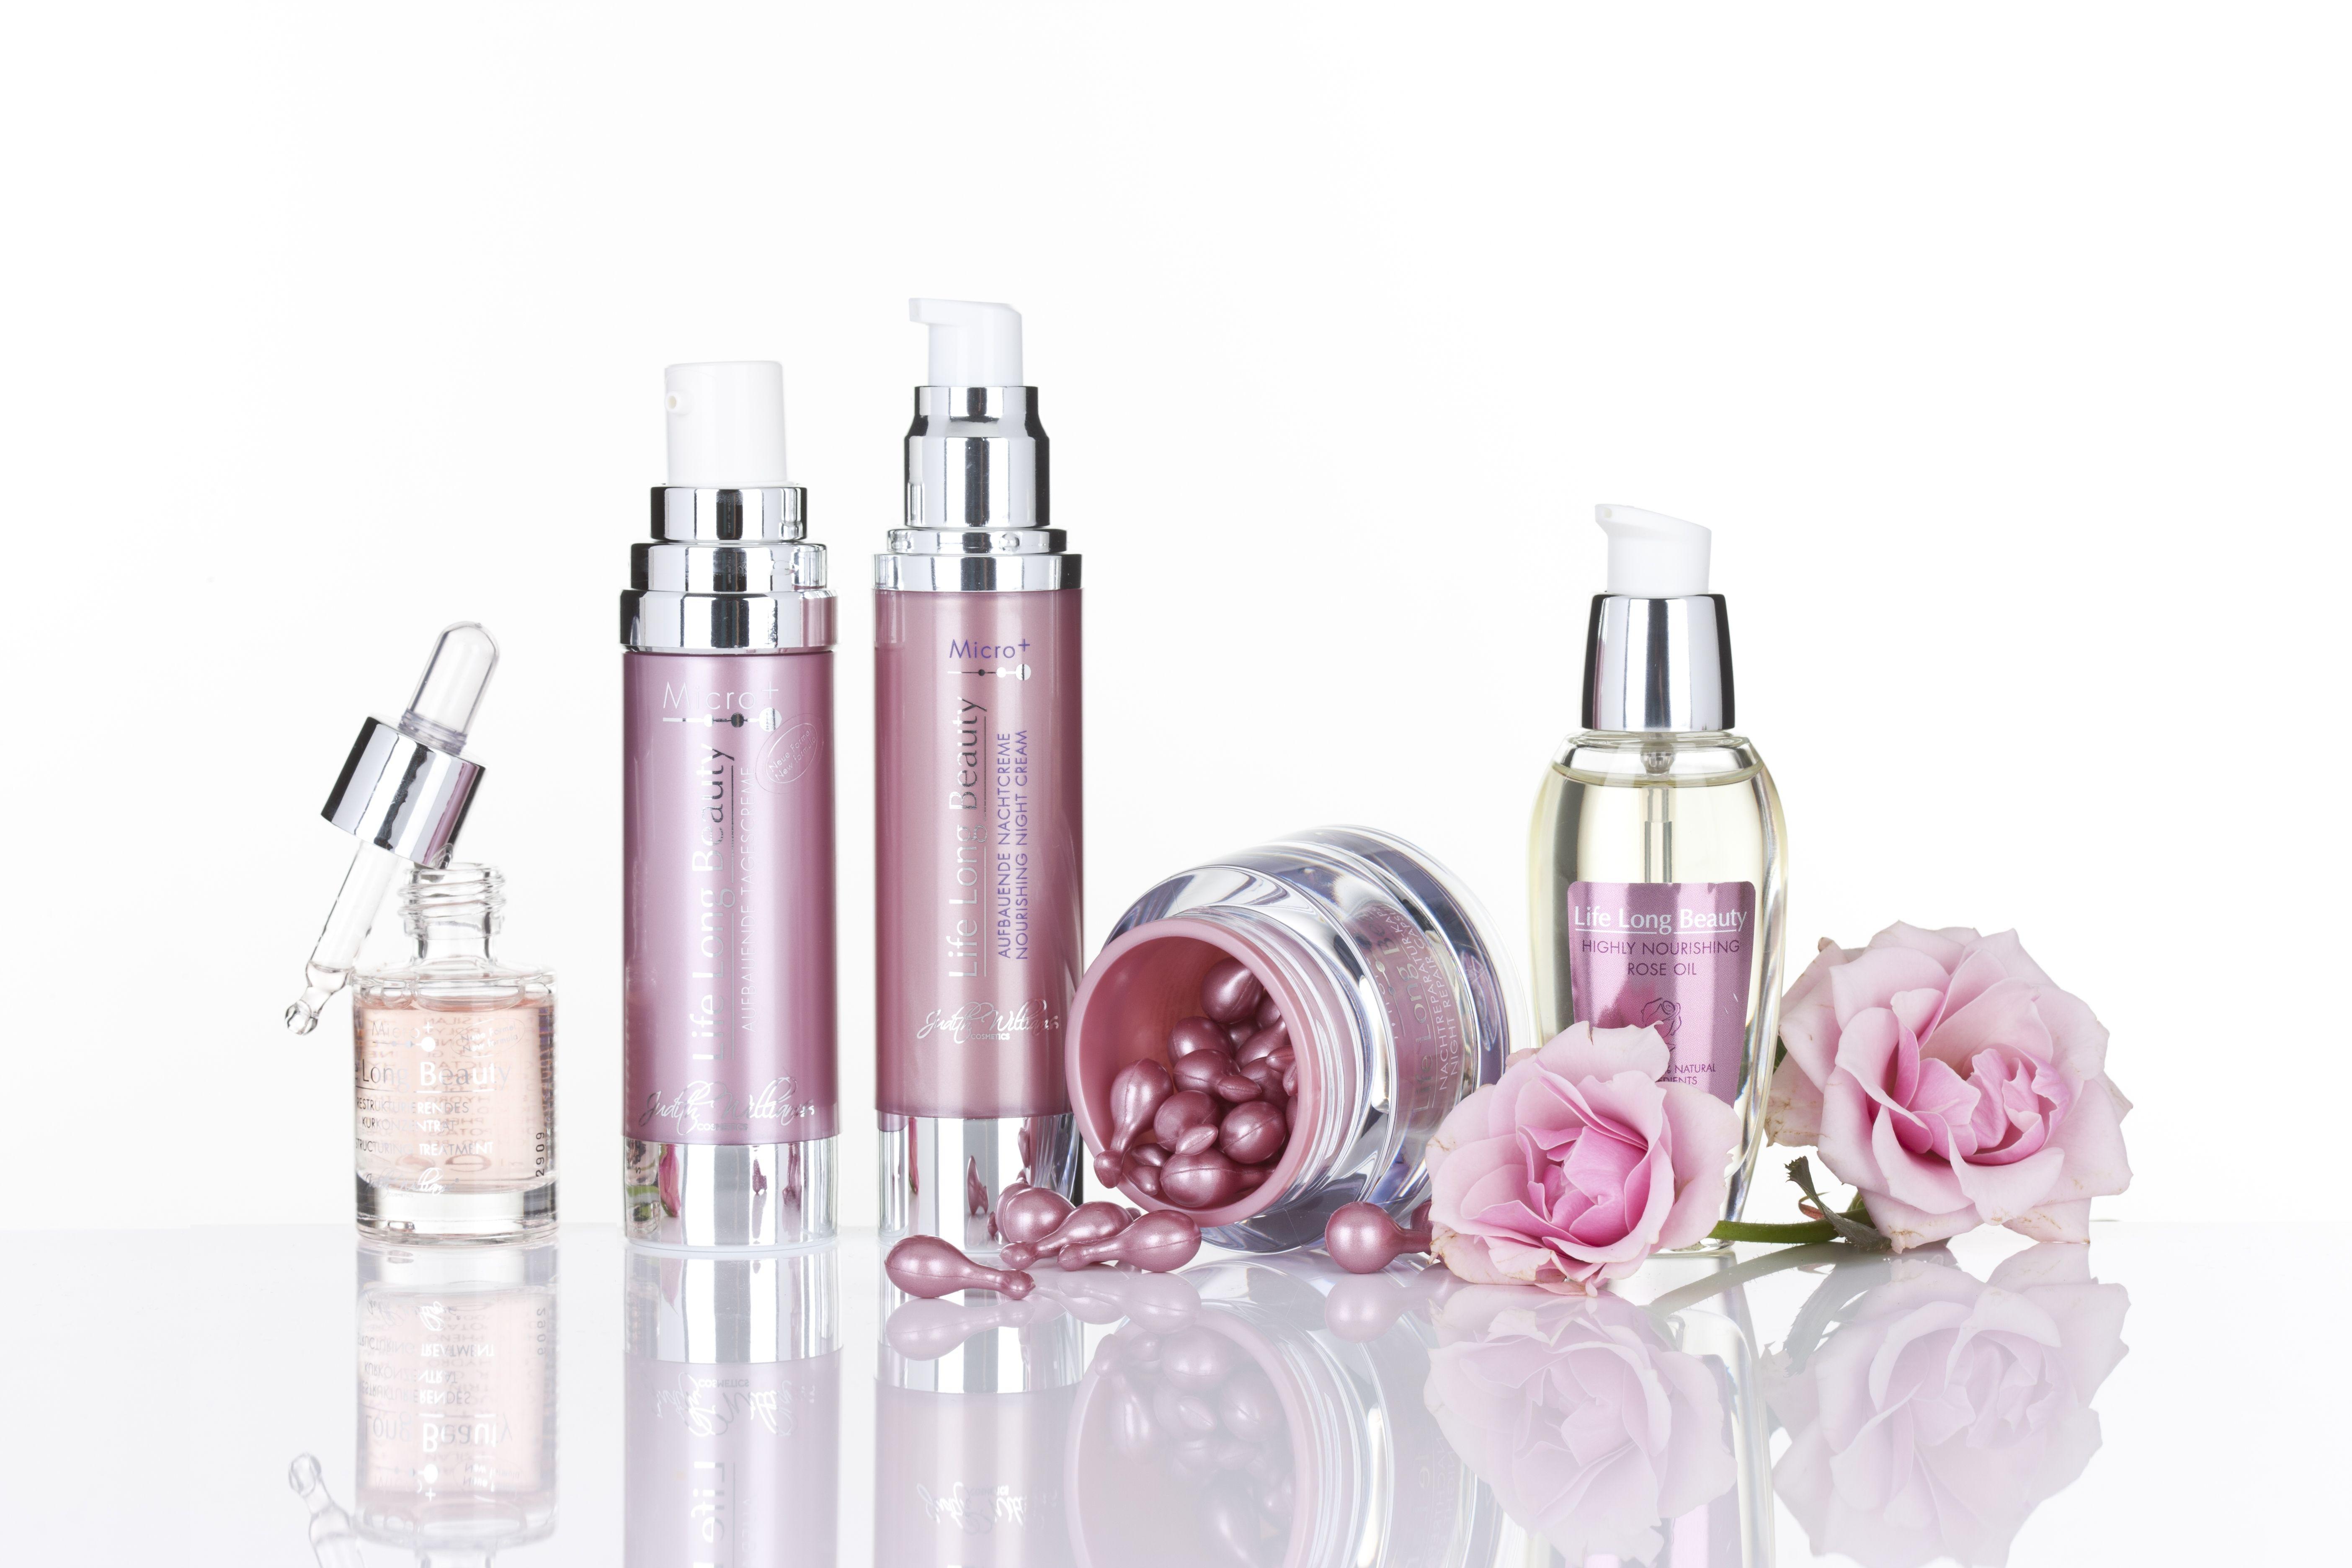 Judith Williams Kosmetiklinie Life Long Beauty